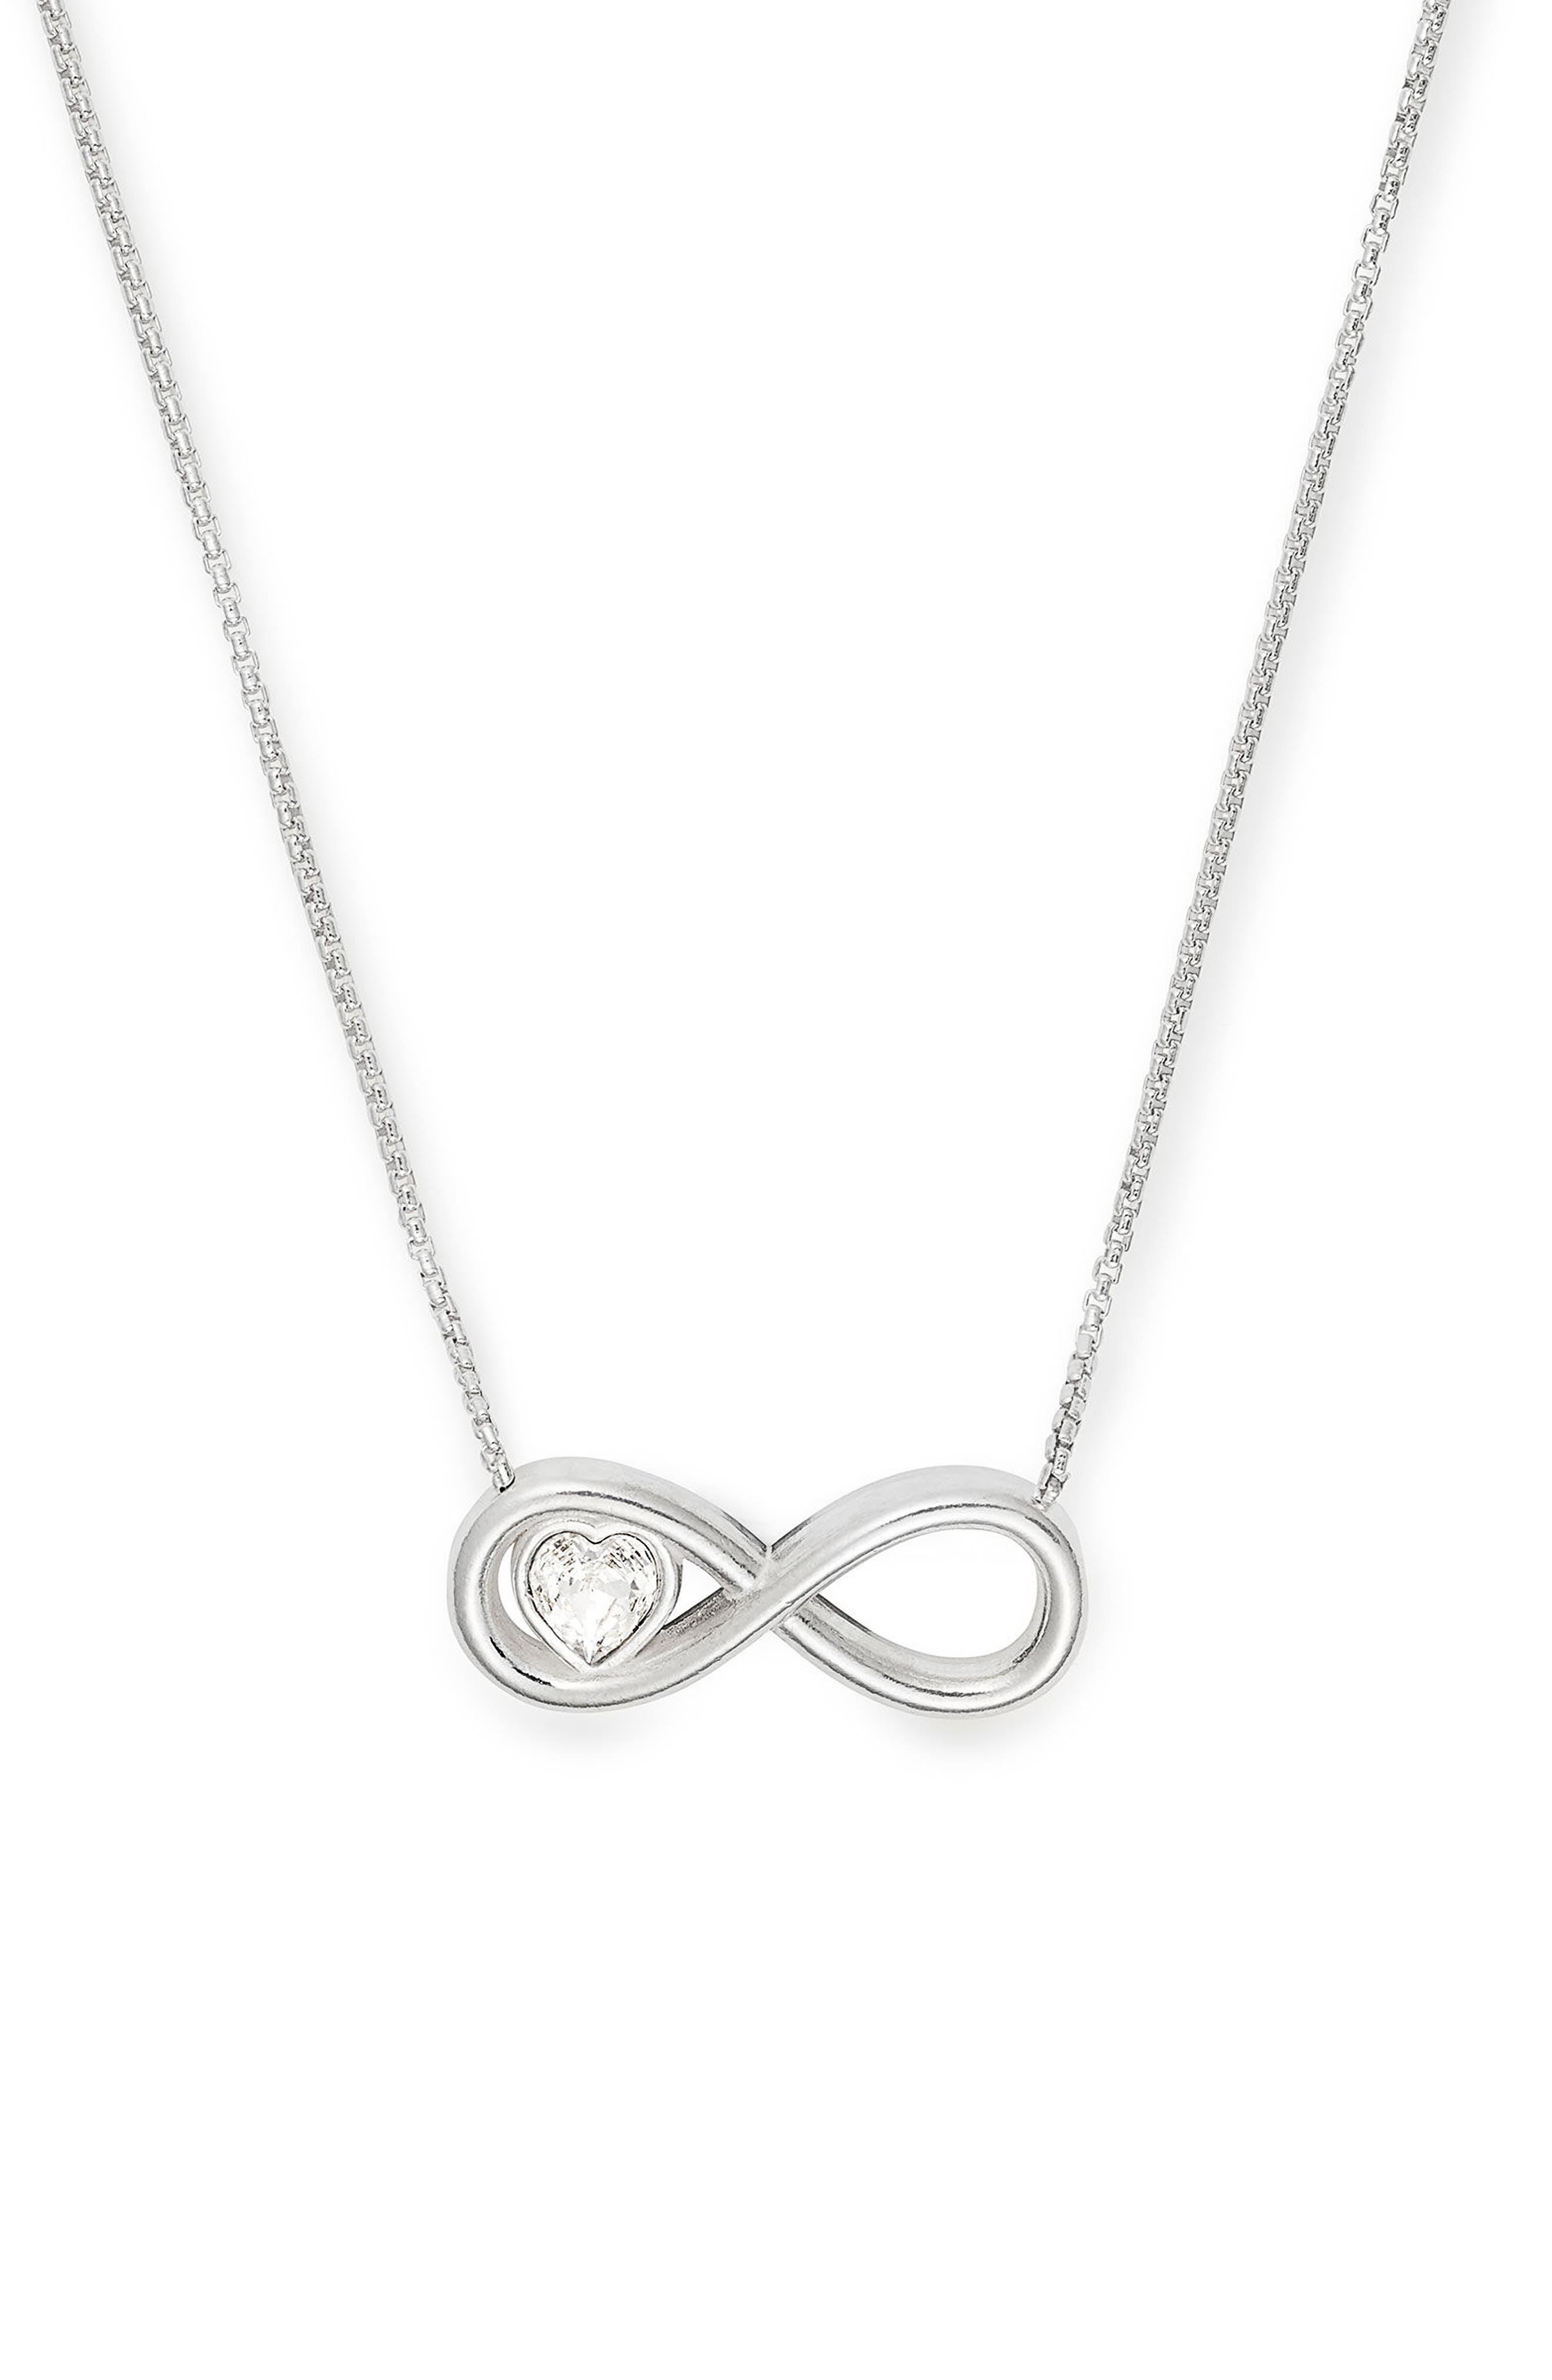 Infinite Love Necklace,                         Main,                         color, Silver